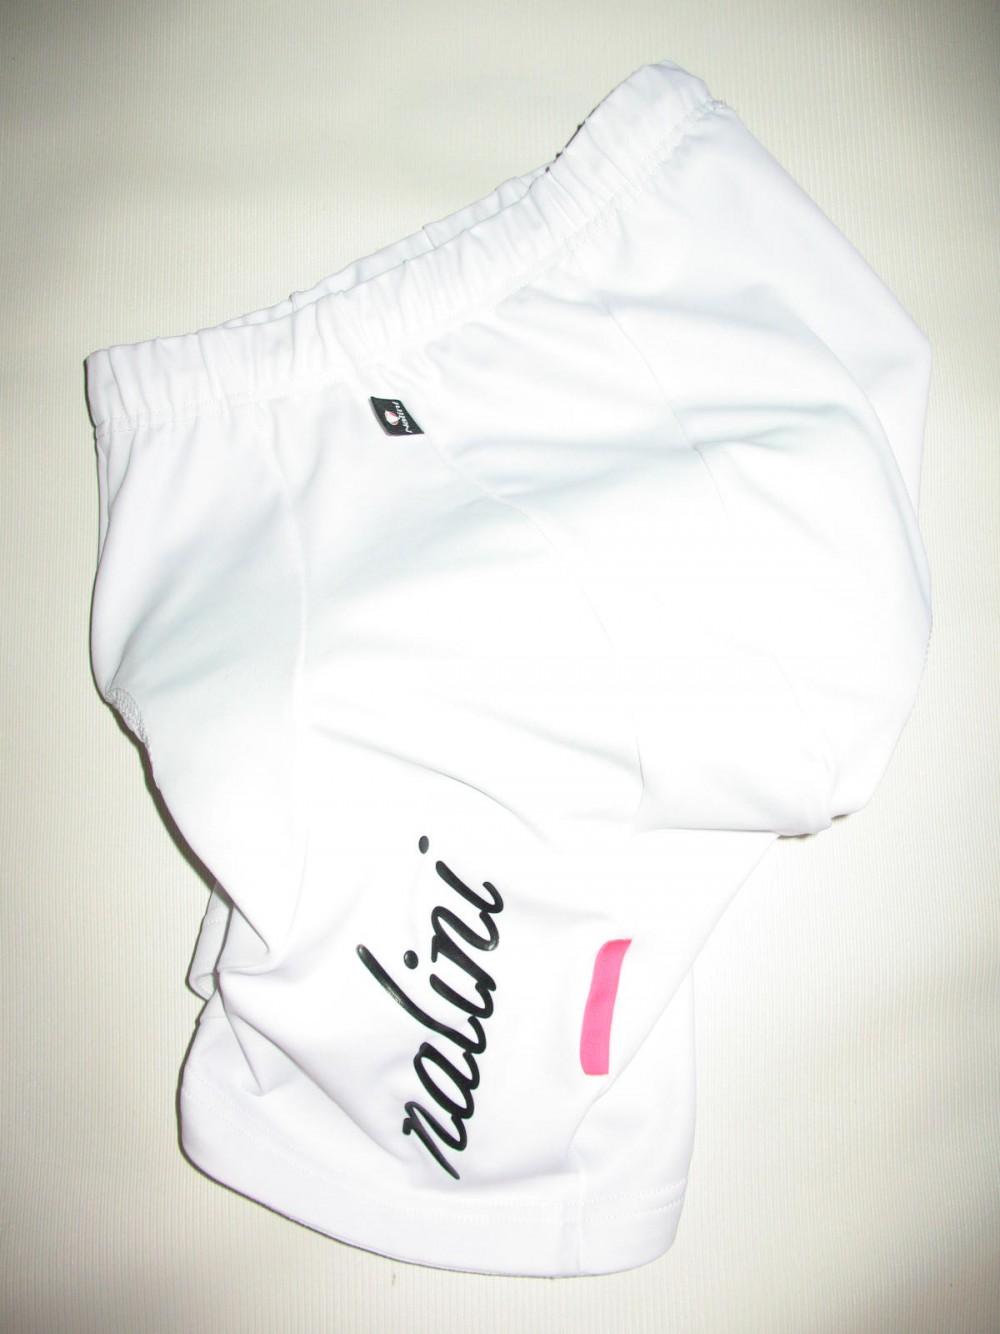 Велошорты NALINI white cycling shorts lady (размер S) - 1